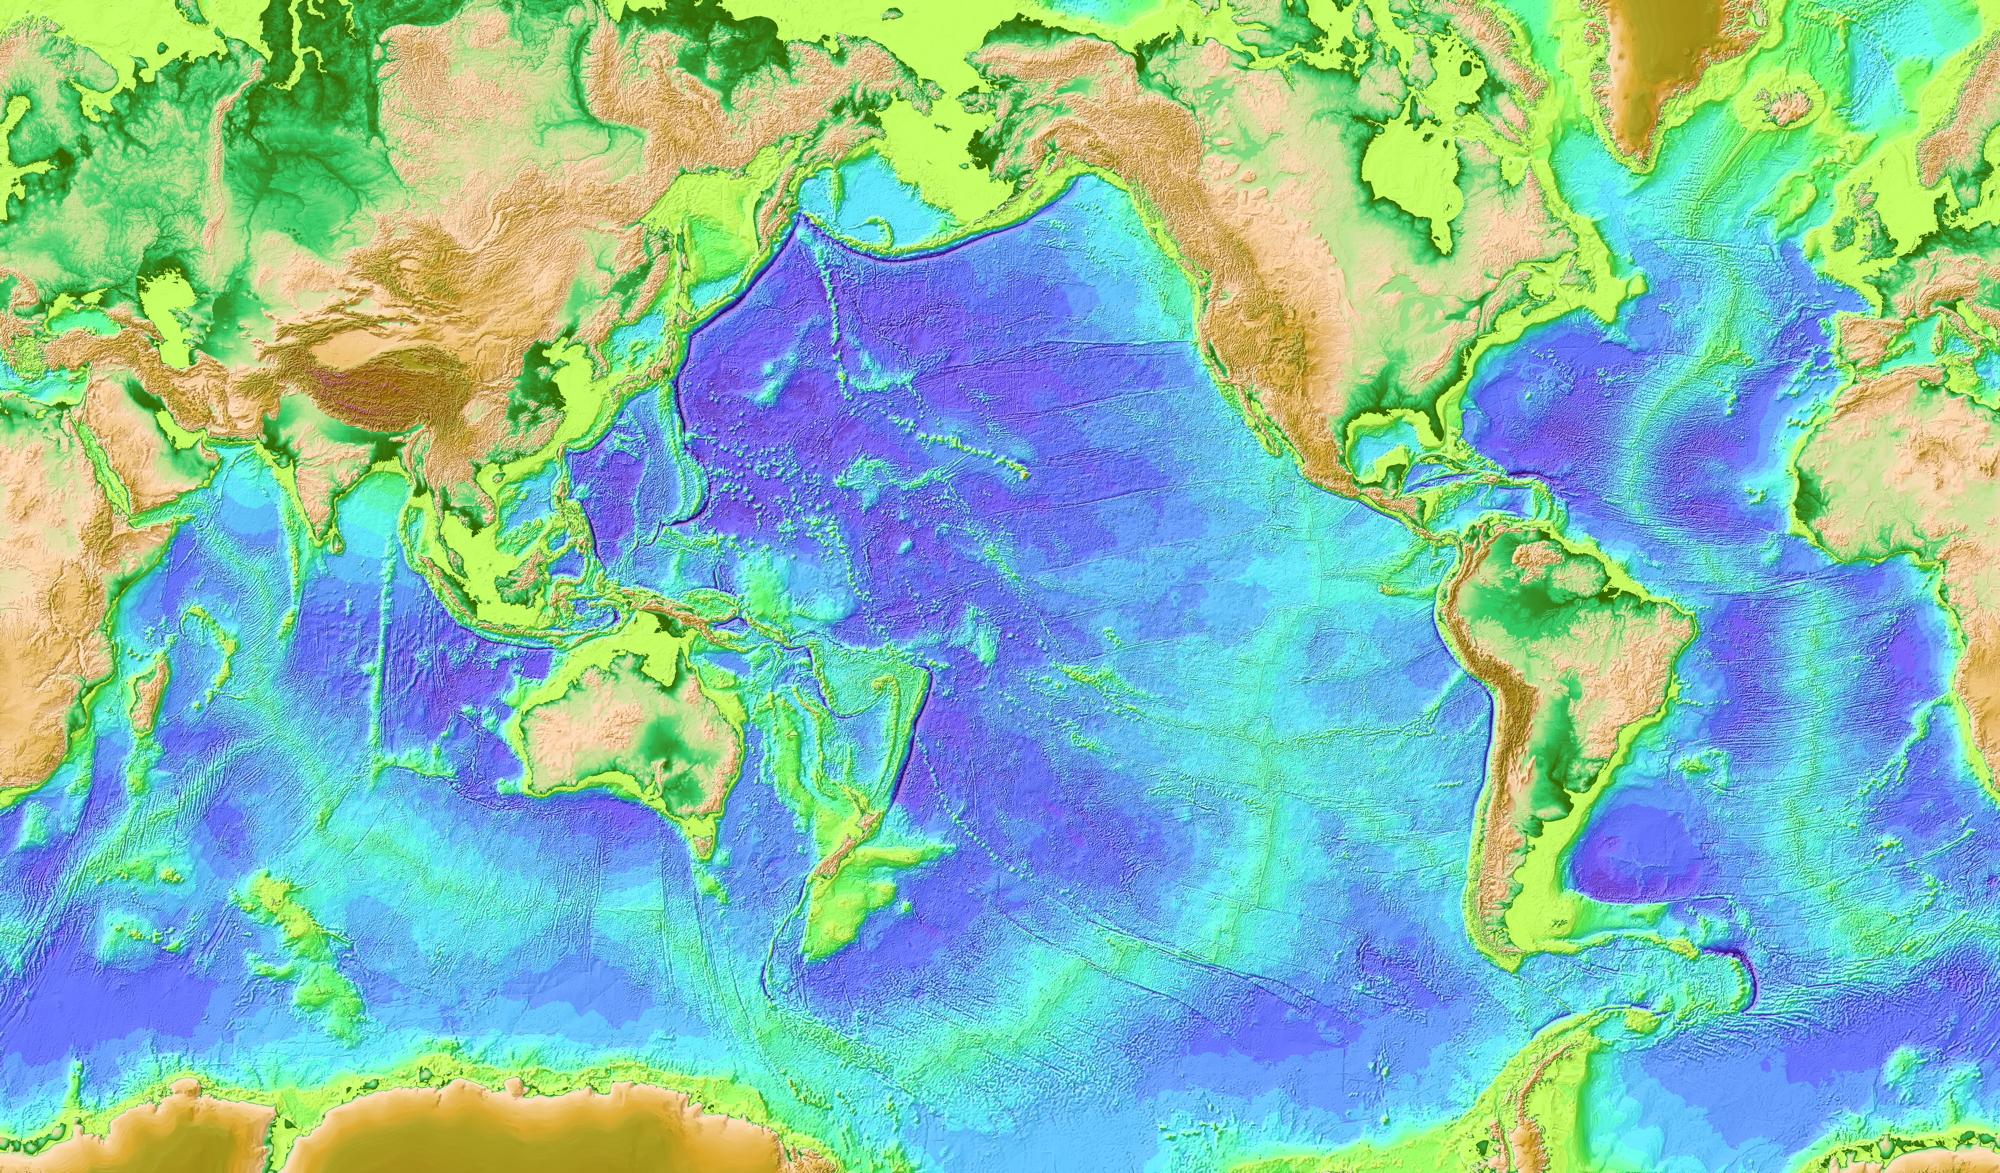 Noaa nesdis star socd laboratory for satellite altimetry global seafloor topography gumiabroncs Gallery